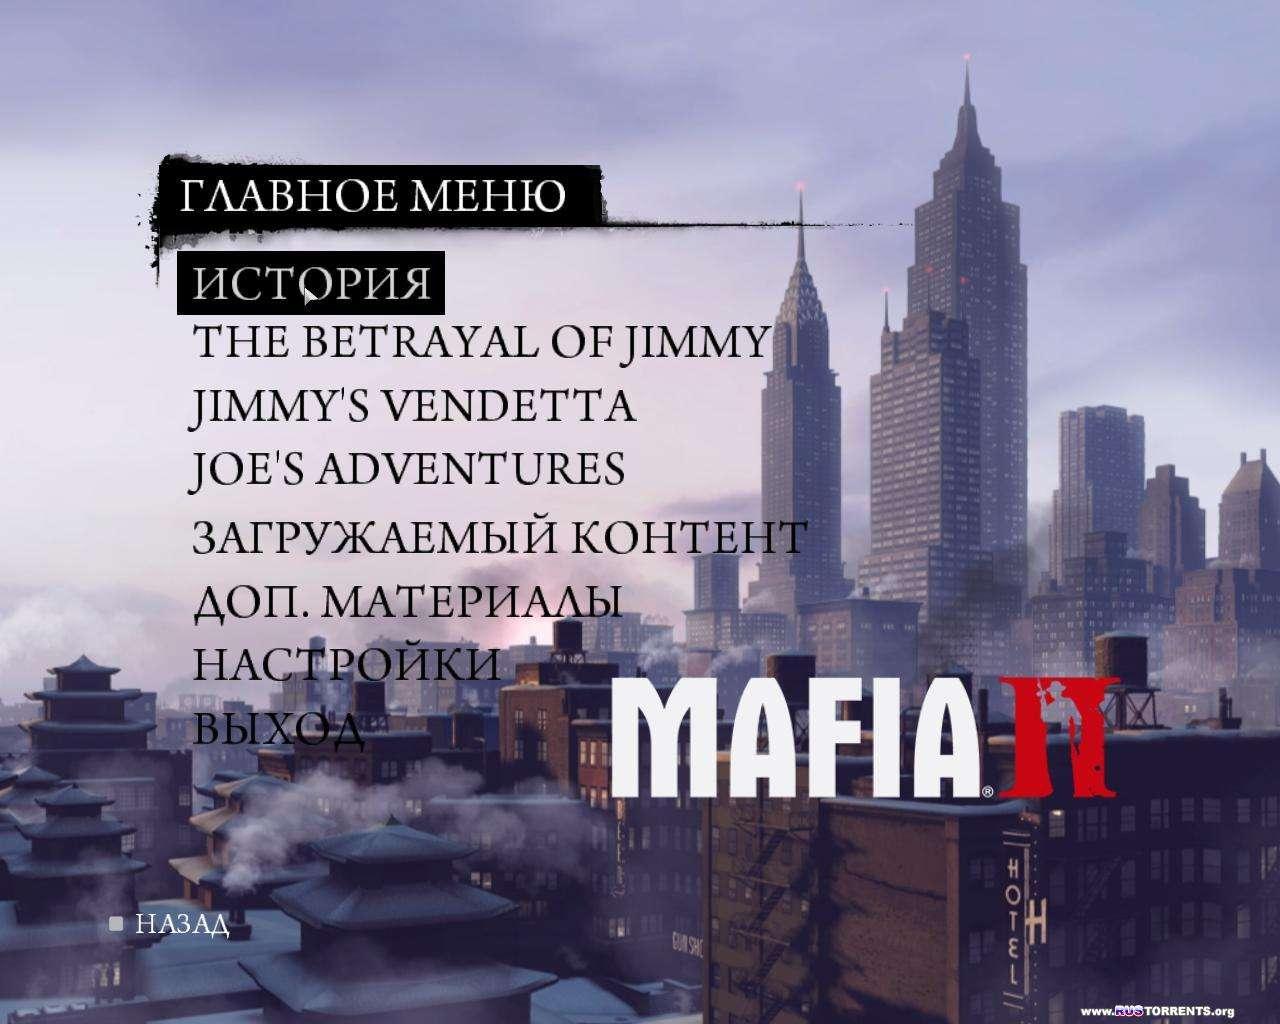 Mafia 2: Digital Deluxe [v 1.0.0.1u5 + 8 DLC] | Repack от Fenixx